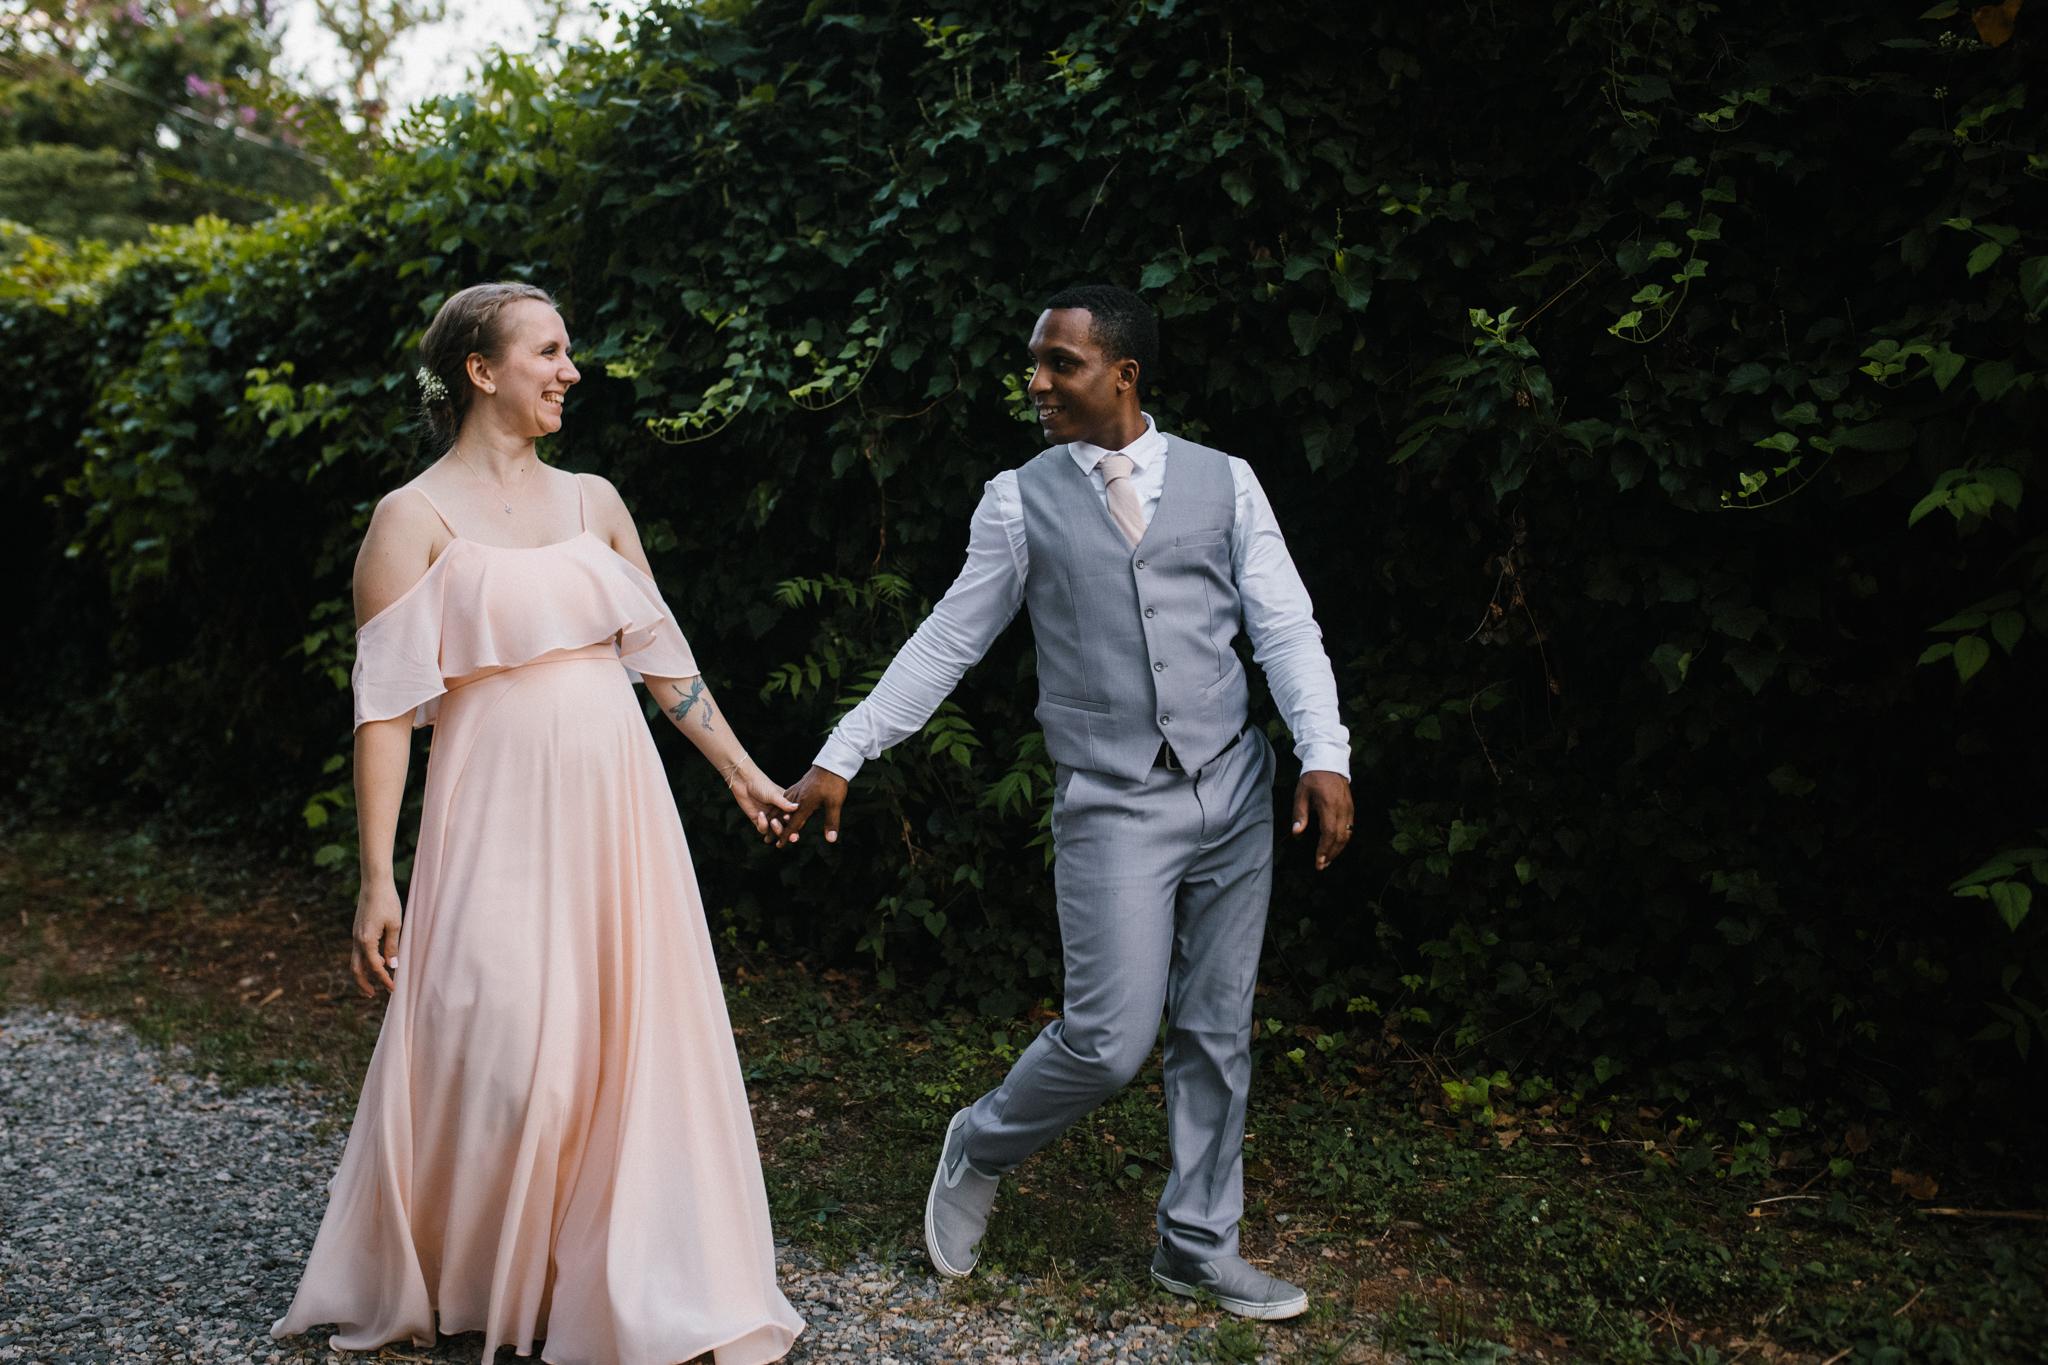 dorota_dwight_richmond_backyard_wedding-76.jpg